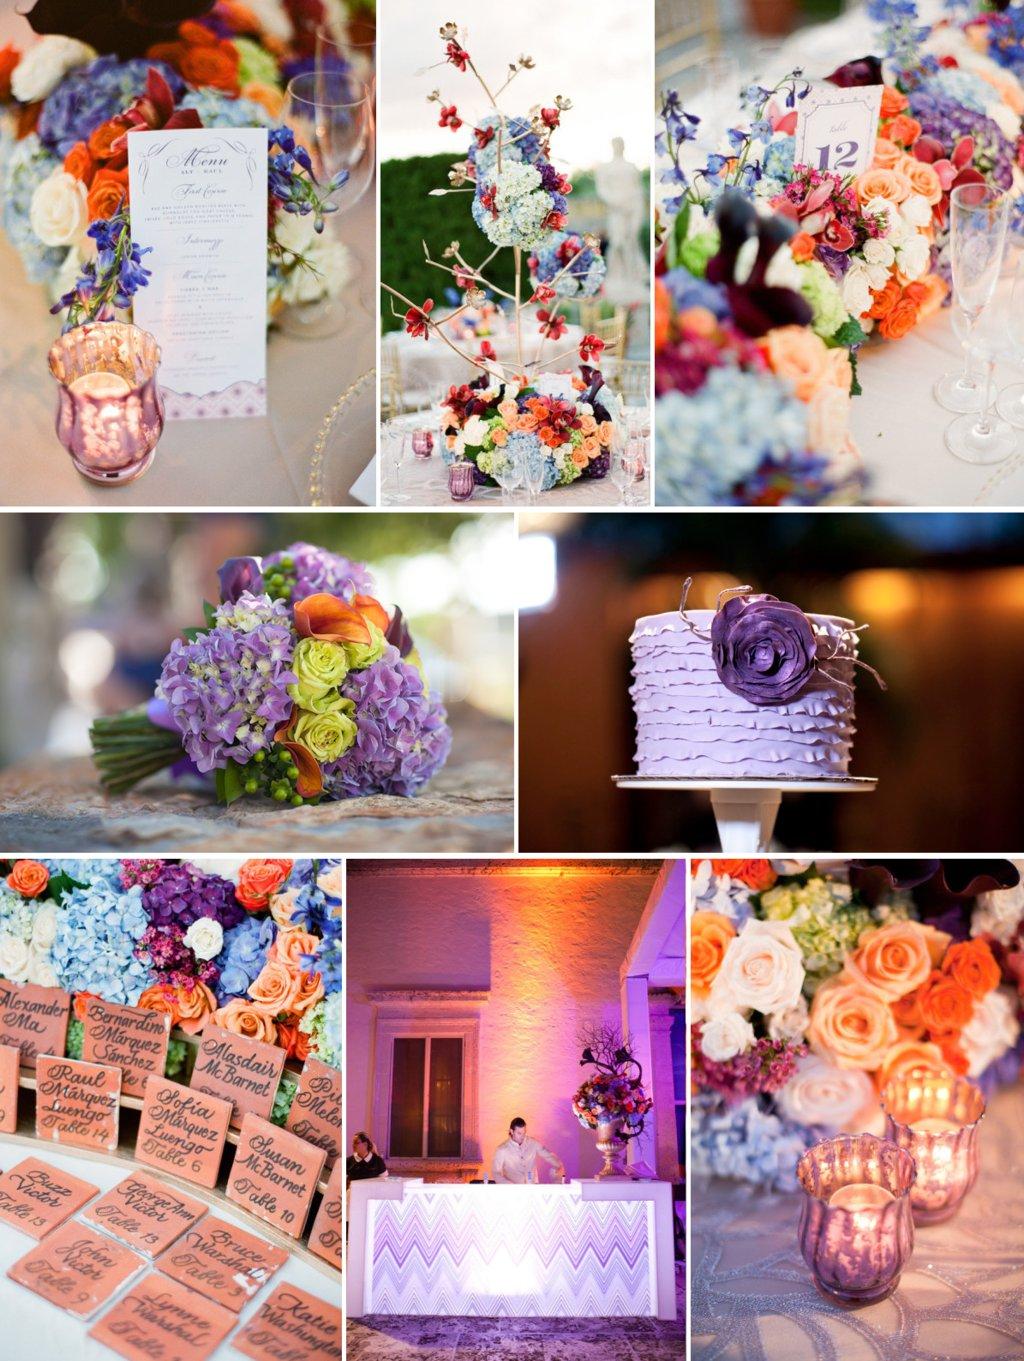 Purple-orange-peach-wedding-color-inspiration-board-dreamsical.full